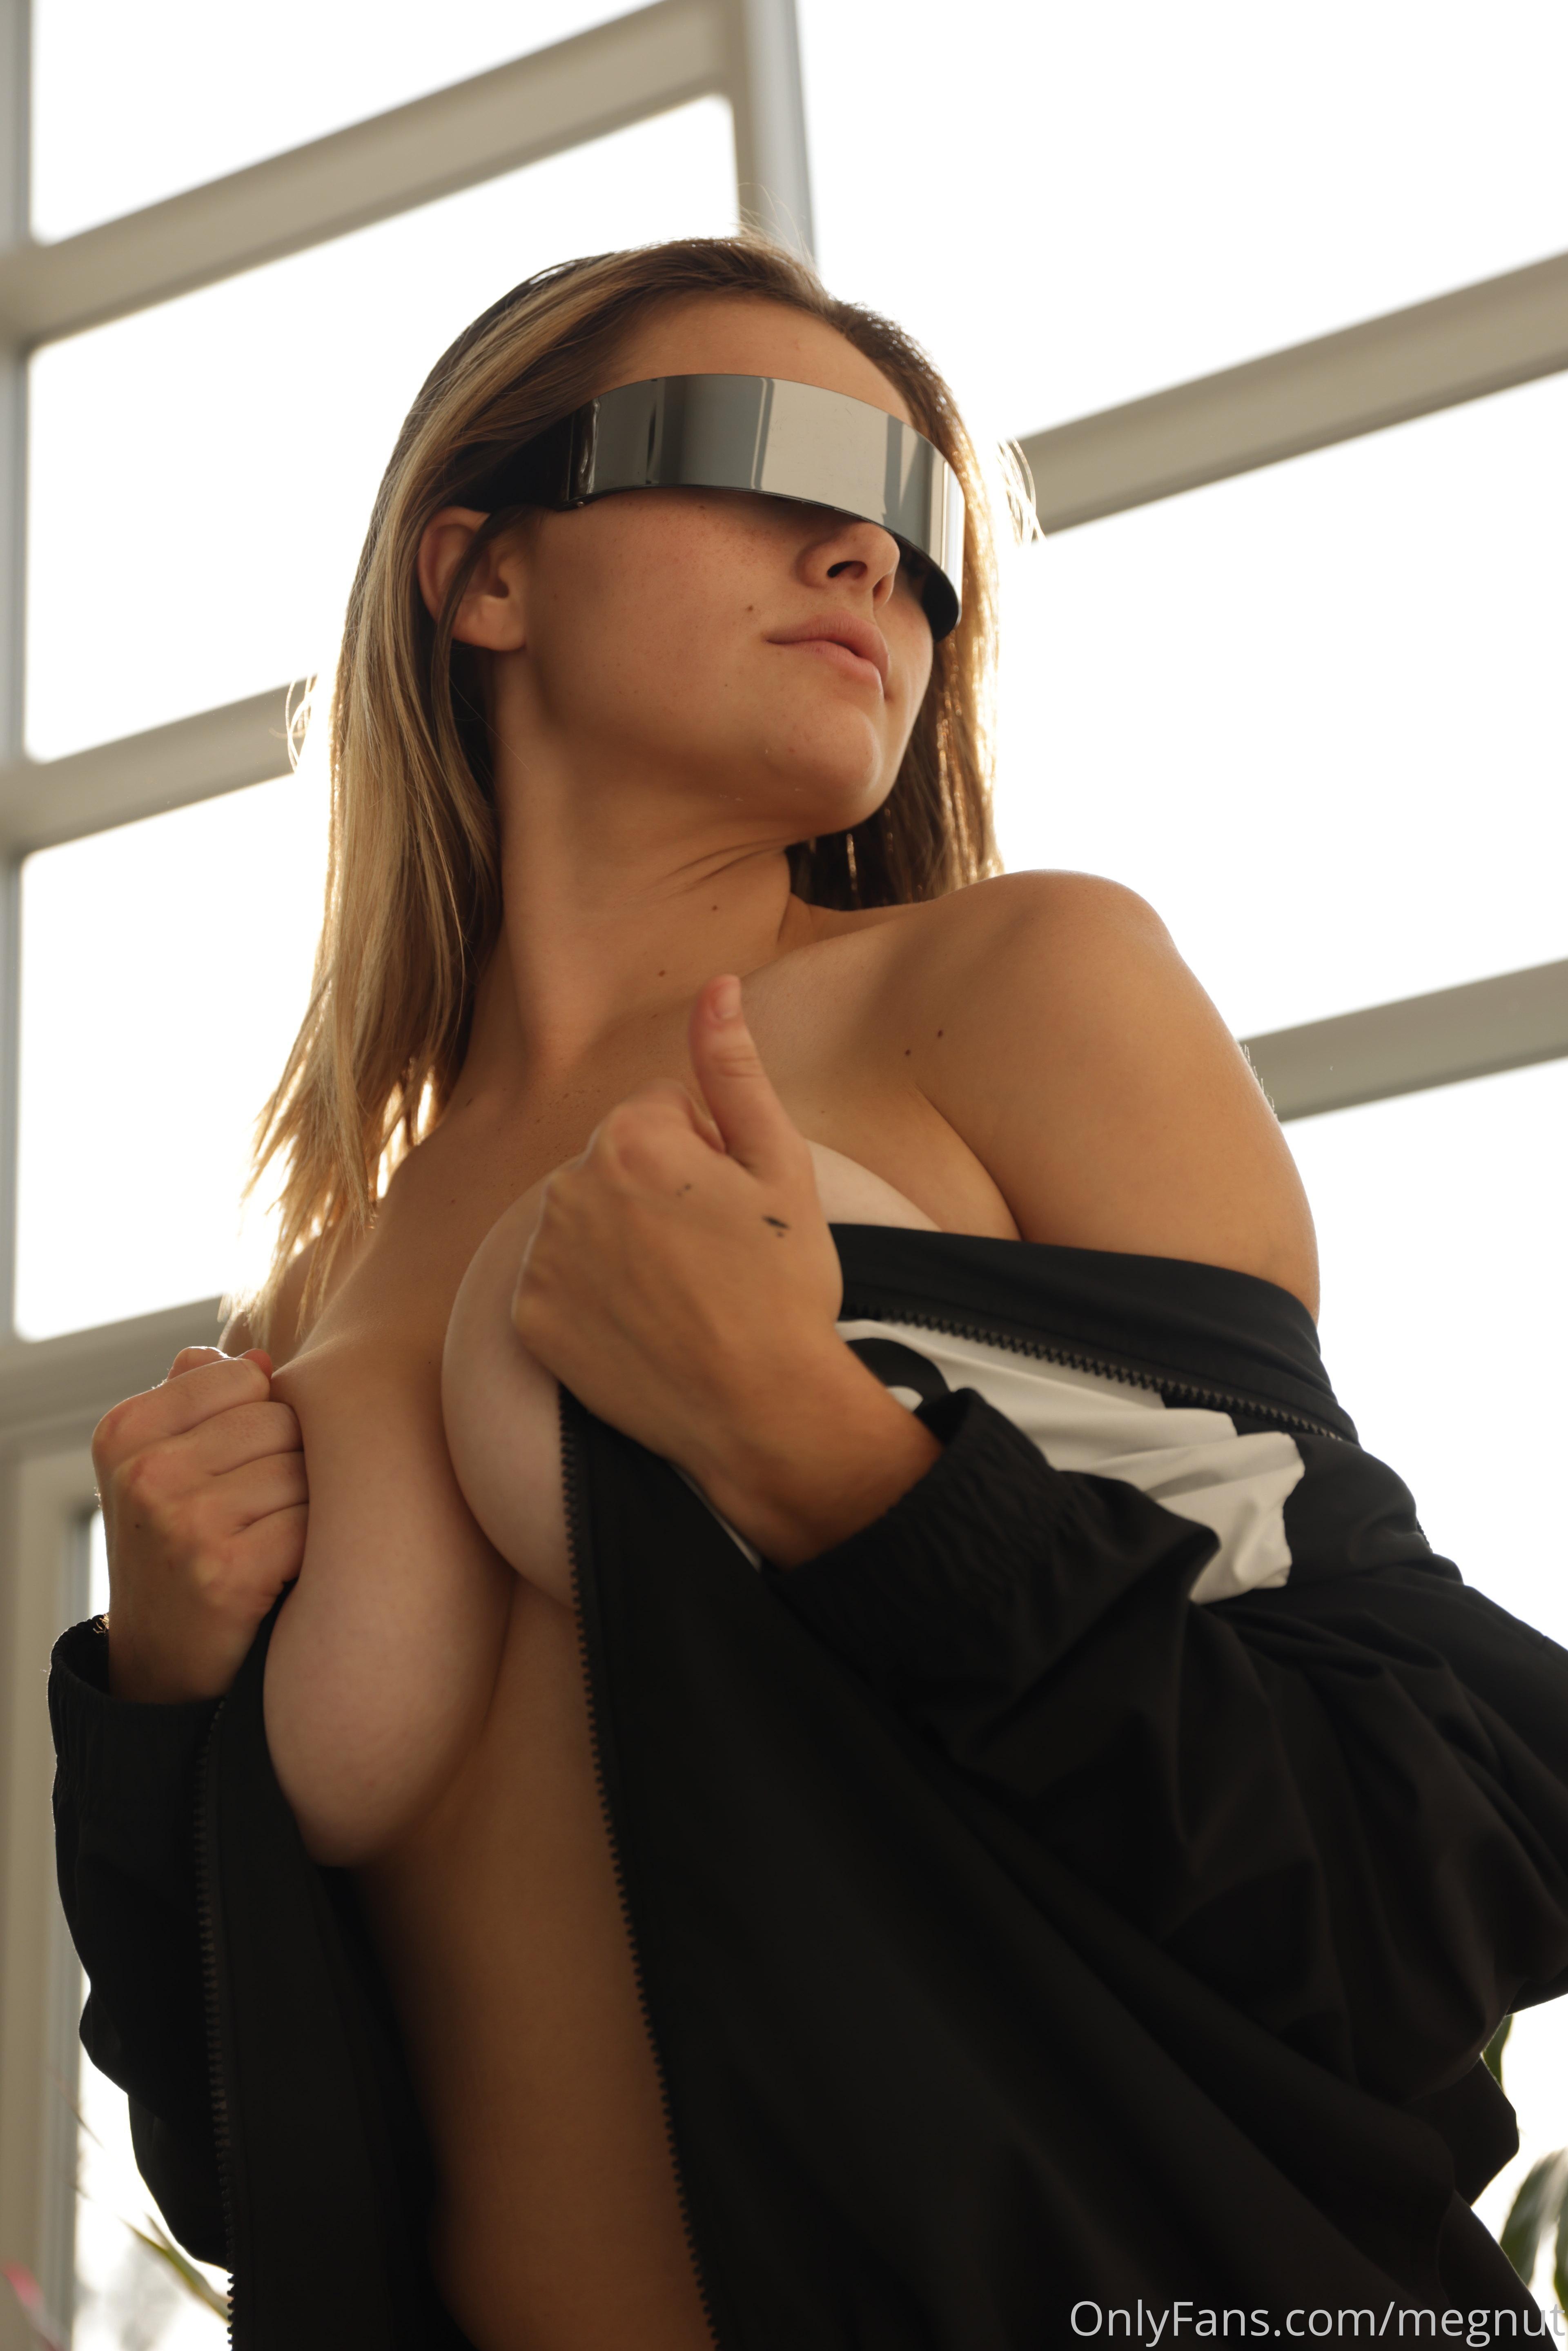 Megan Guthrie Nude Leaked 0032